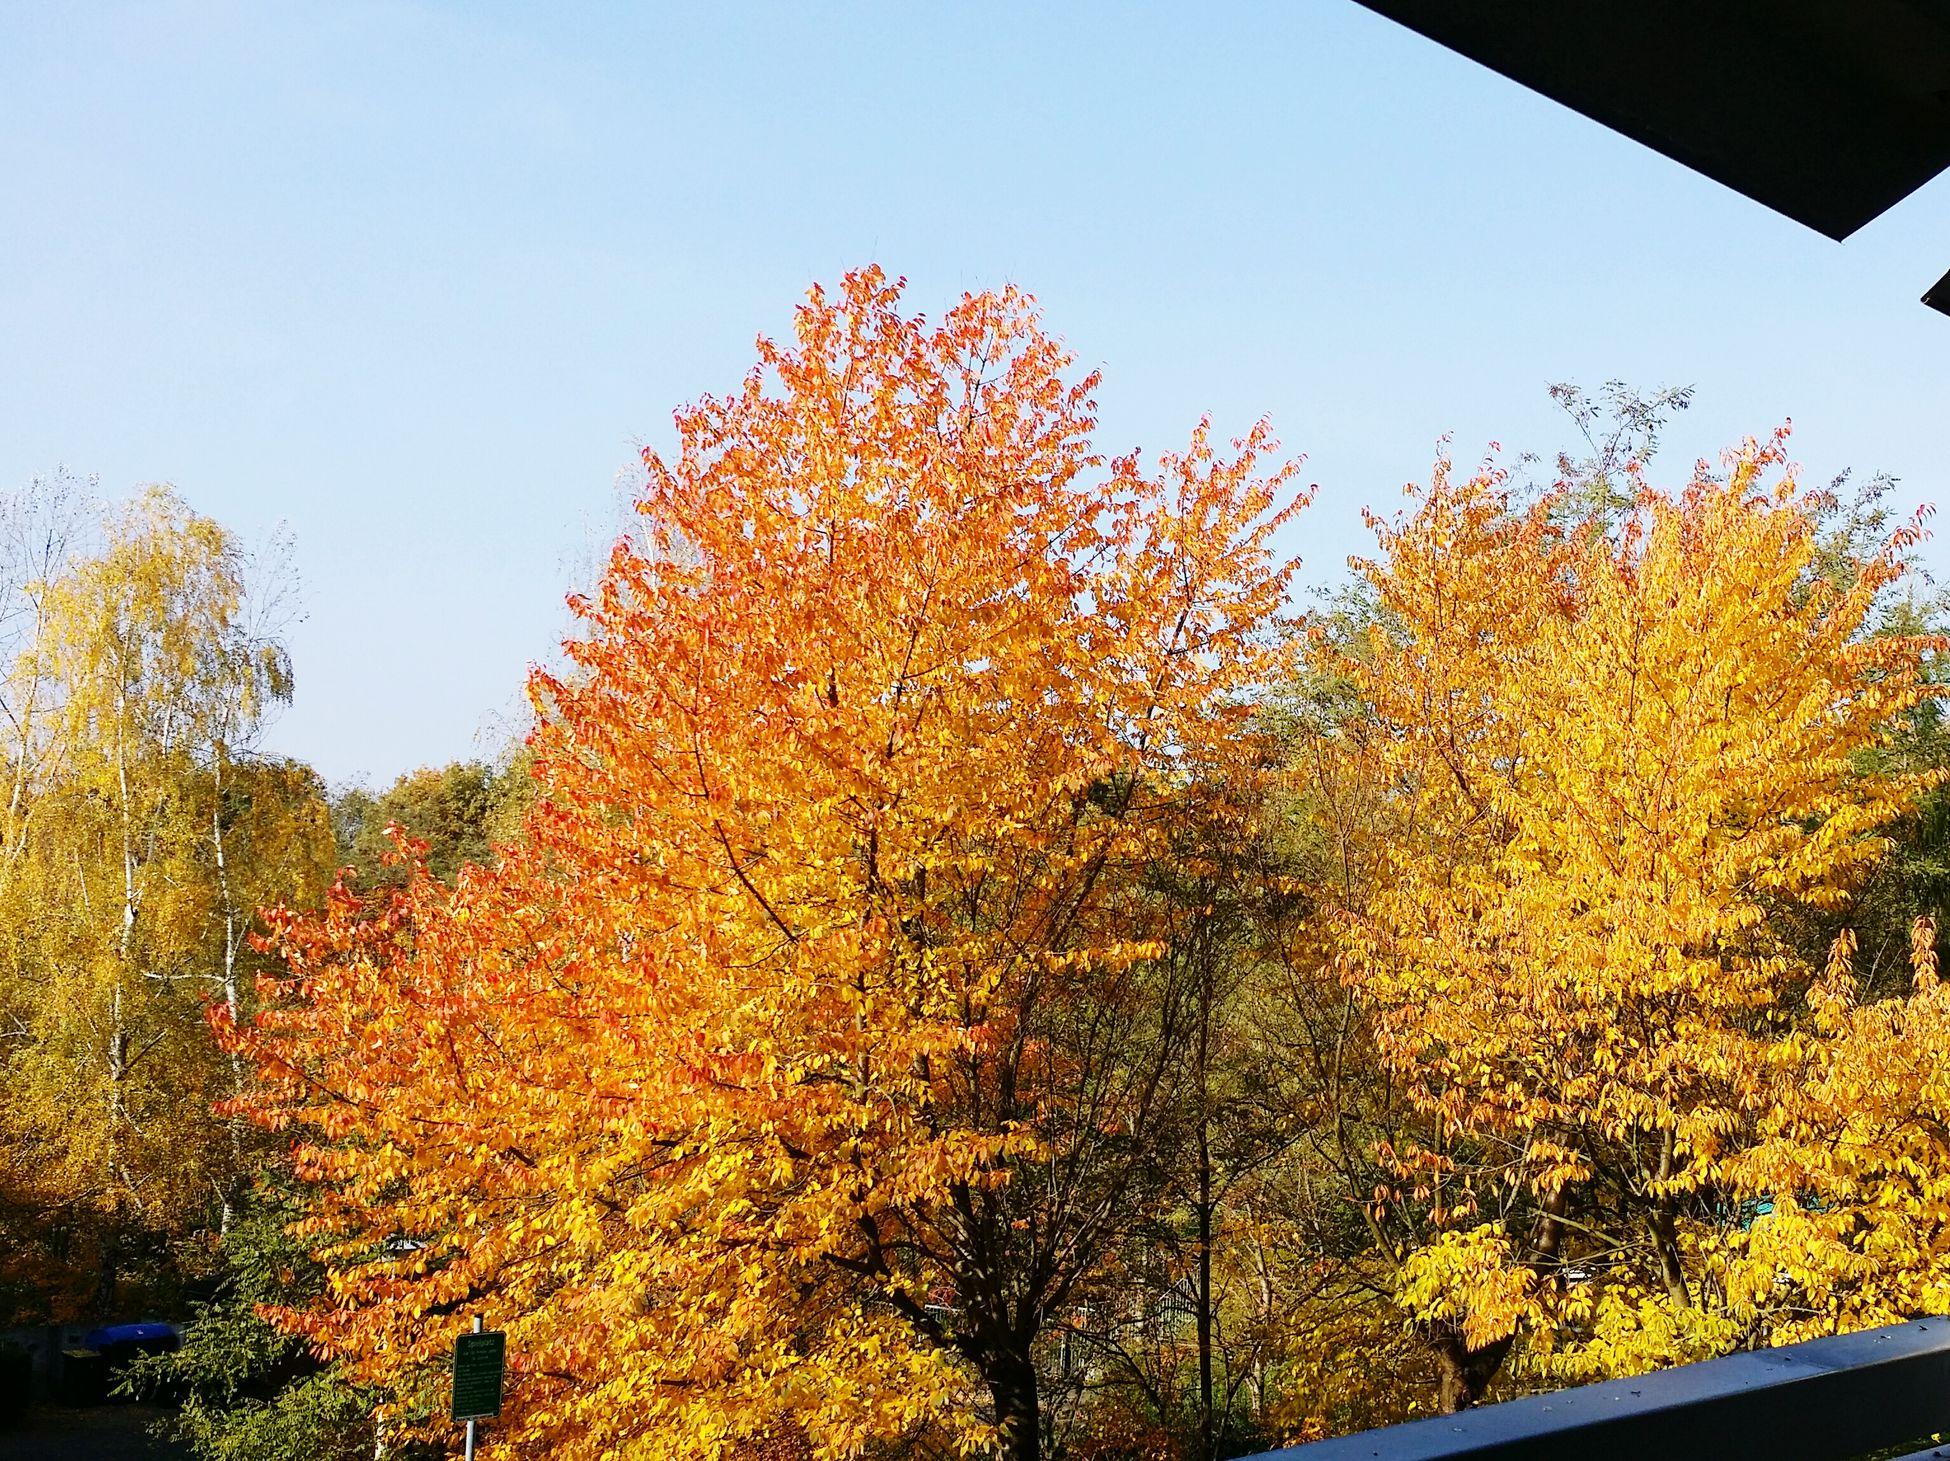 Dresden Autumn Autumn🍁🍁🍁 Autumn Colors Autumn Impression Autumn Impressions Herbst Herbststimmung Herbstfarben Colorful Yellow Gelb Tree Trees Baum Bäume 🍁🍃🍂🌿🌲🌳🌰